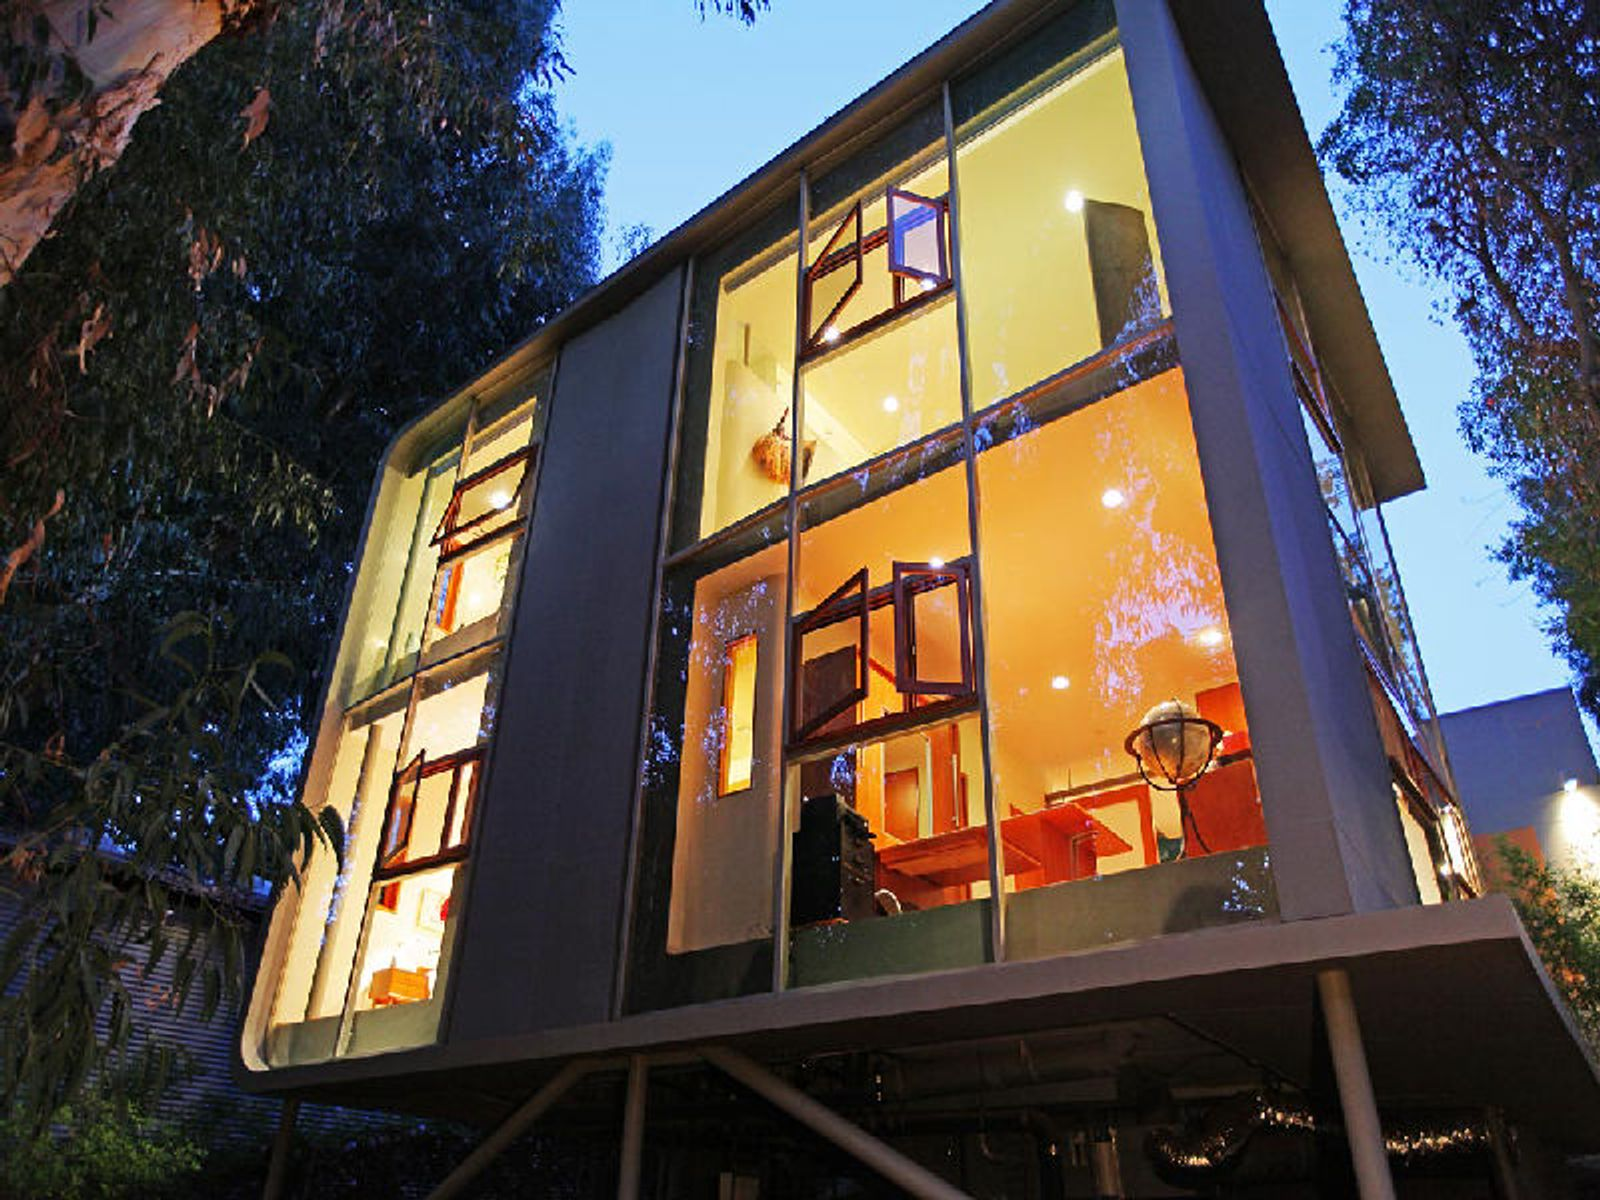 Award Winning Architect Lorcan O'Herlihy